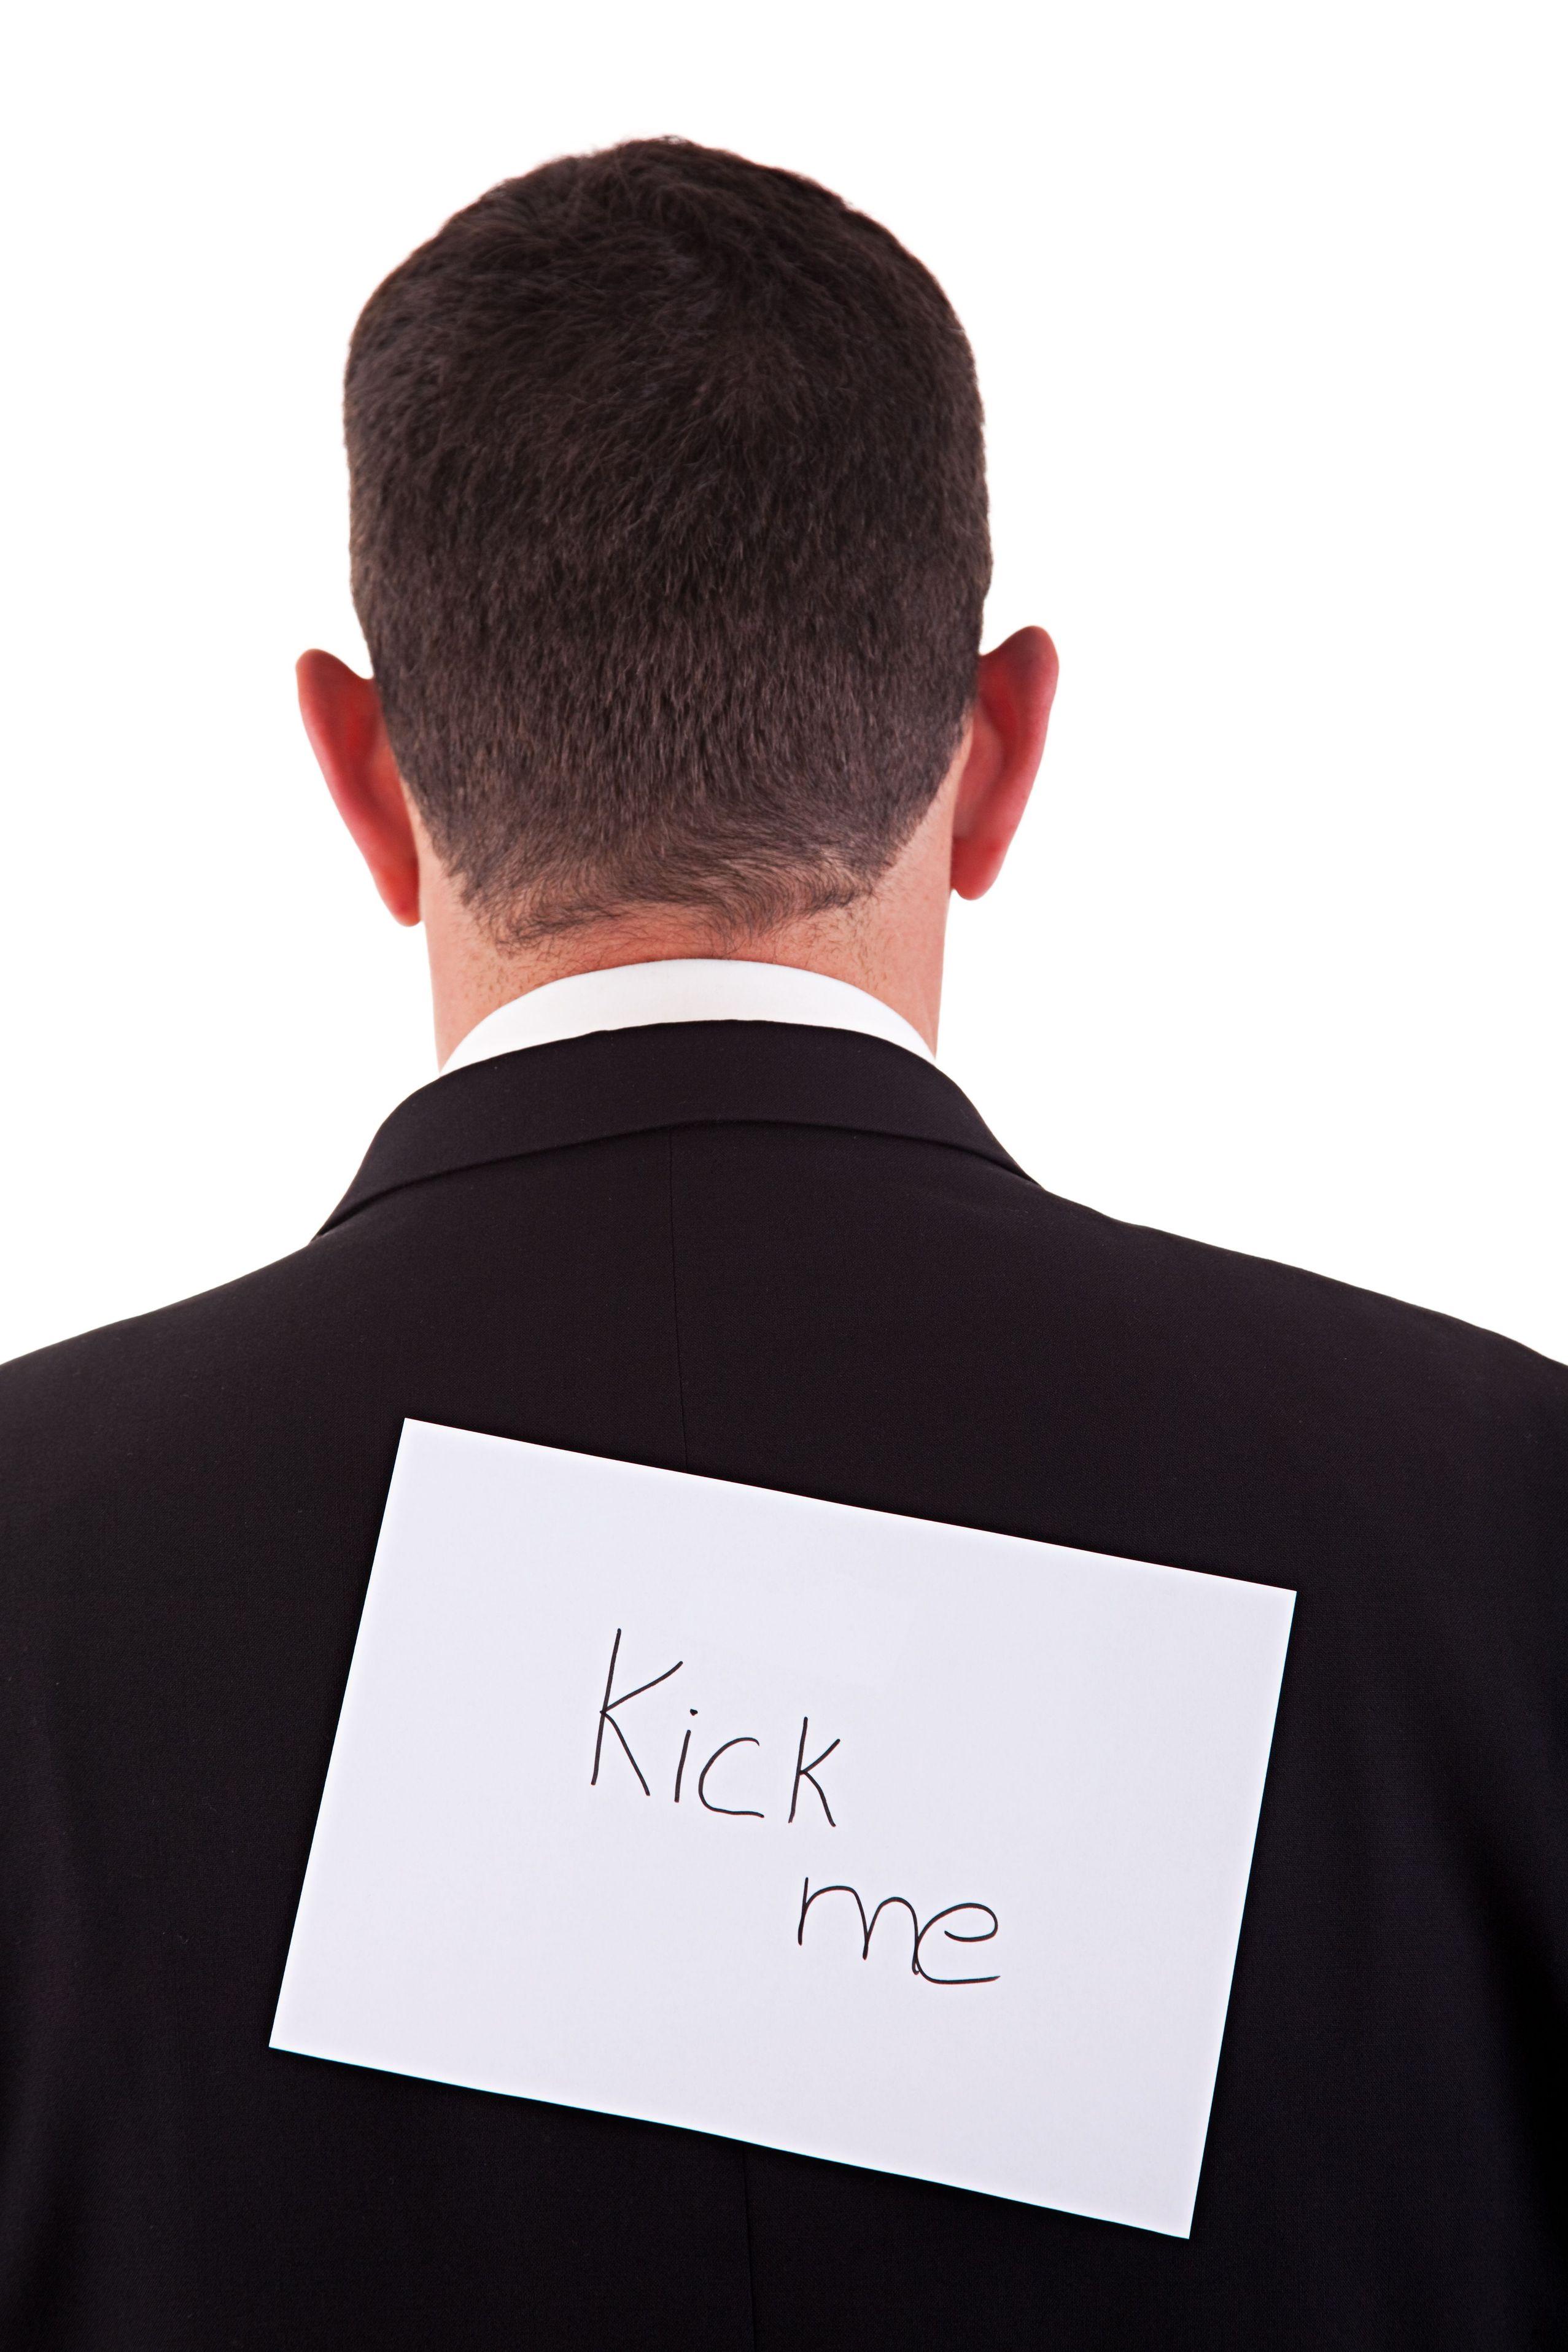 kick-me-sign